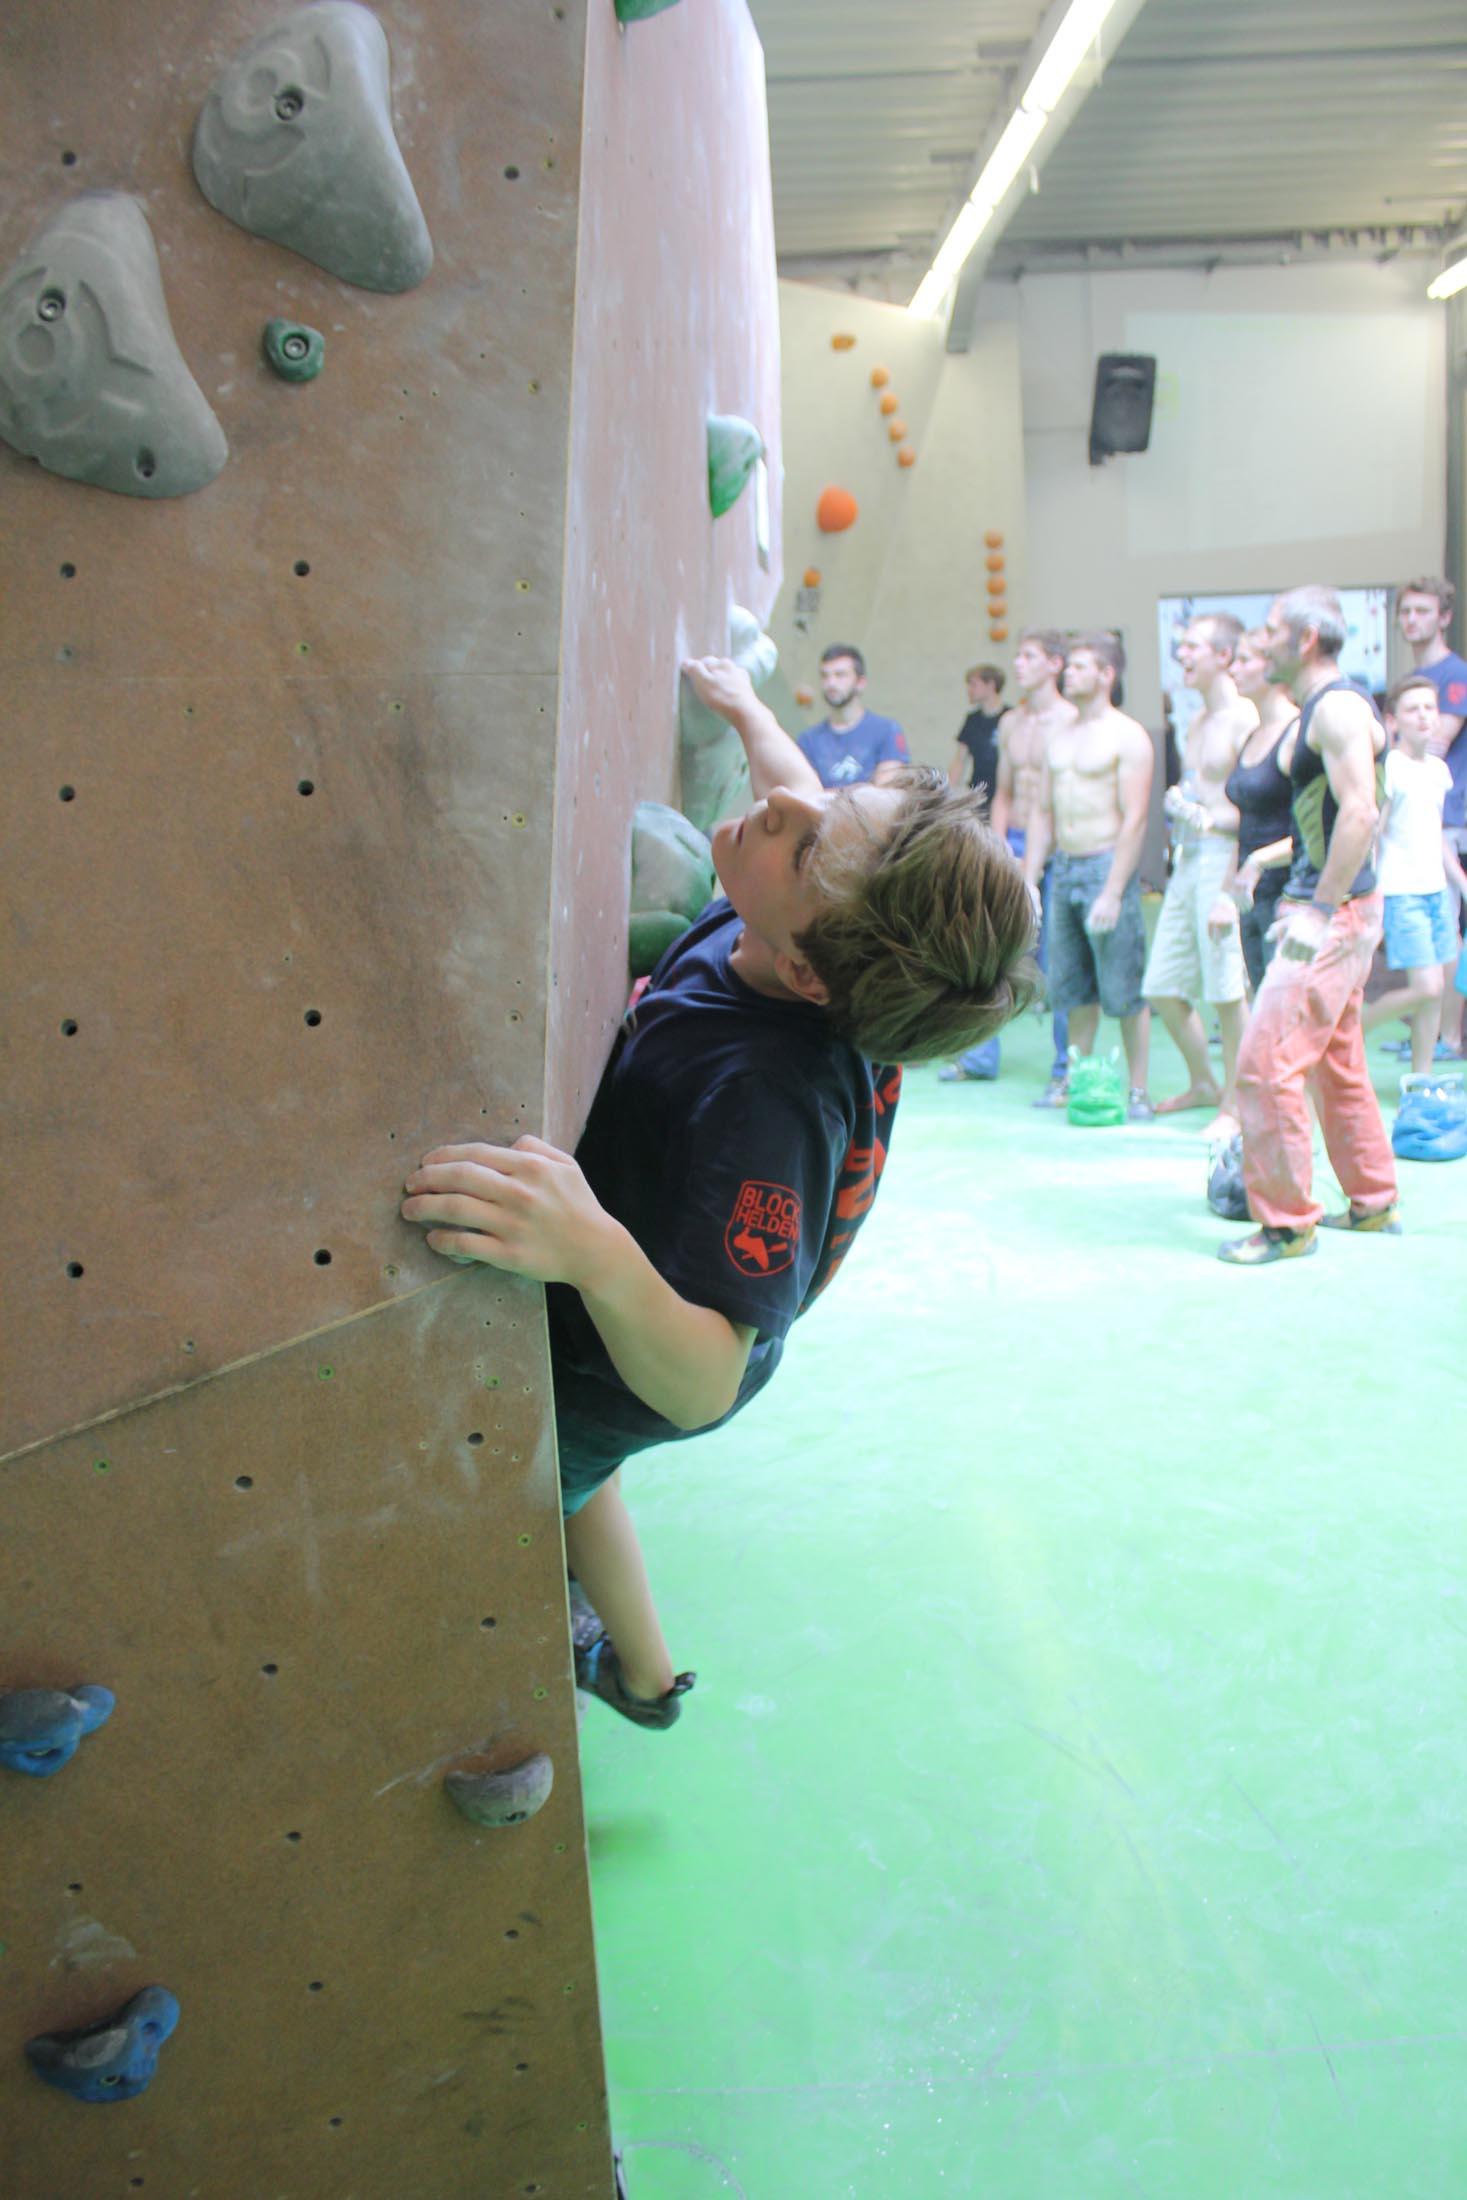 Quali, internationaler bouldercup Frankenjura 2016, BLOCKHELDEN Erlangen, Mammut, Bergfreunde.de, Boulderwettkampf07092016316